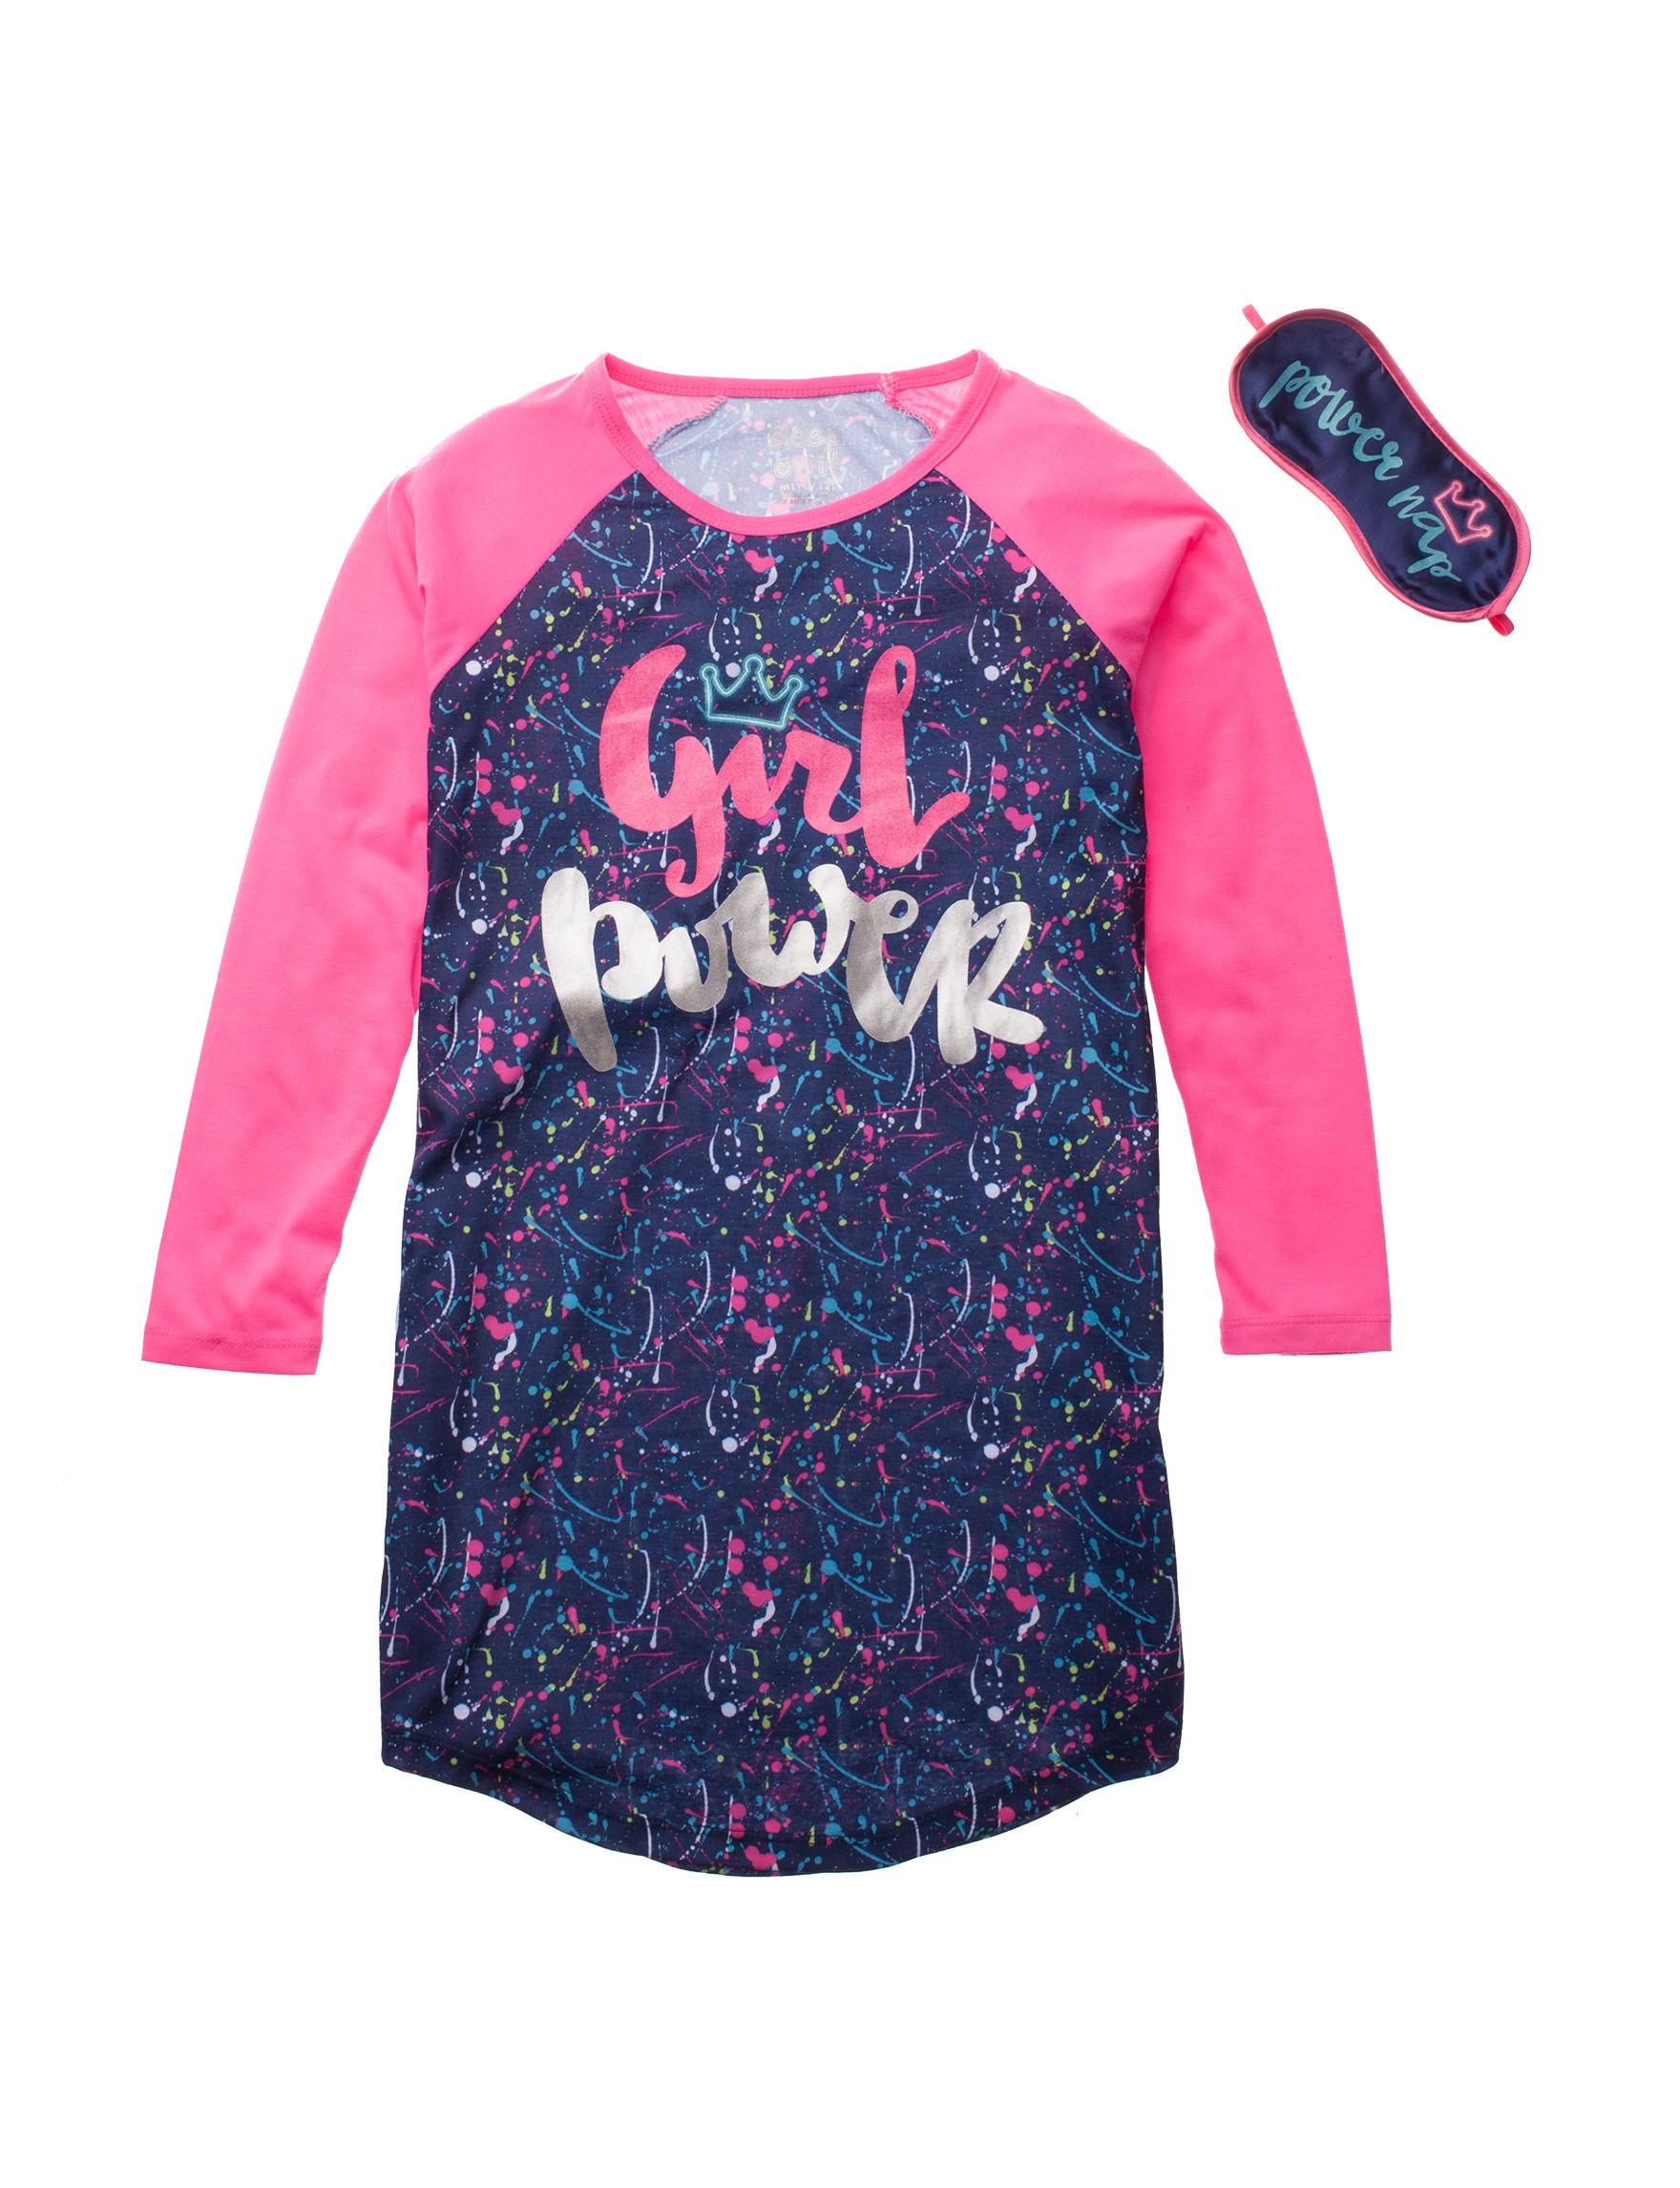 Cloud Nine Navy / Pink Nightgowns & Sleep Shirts